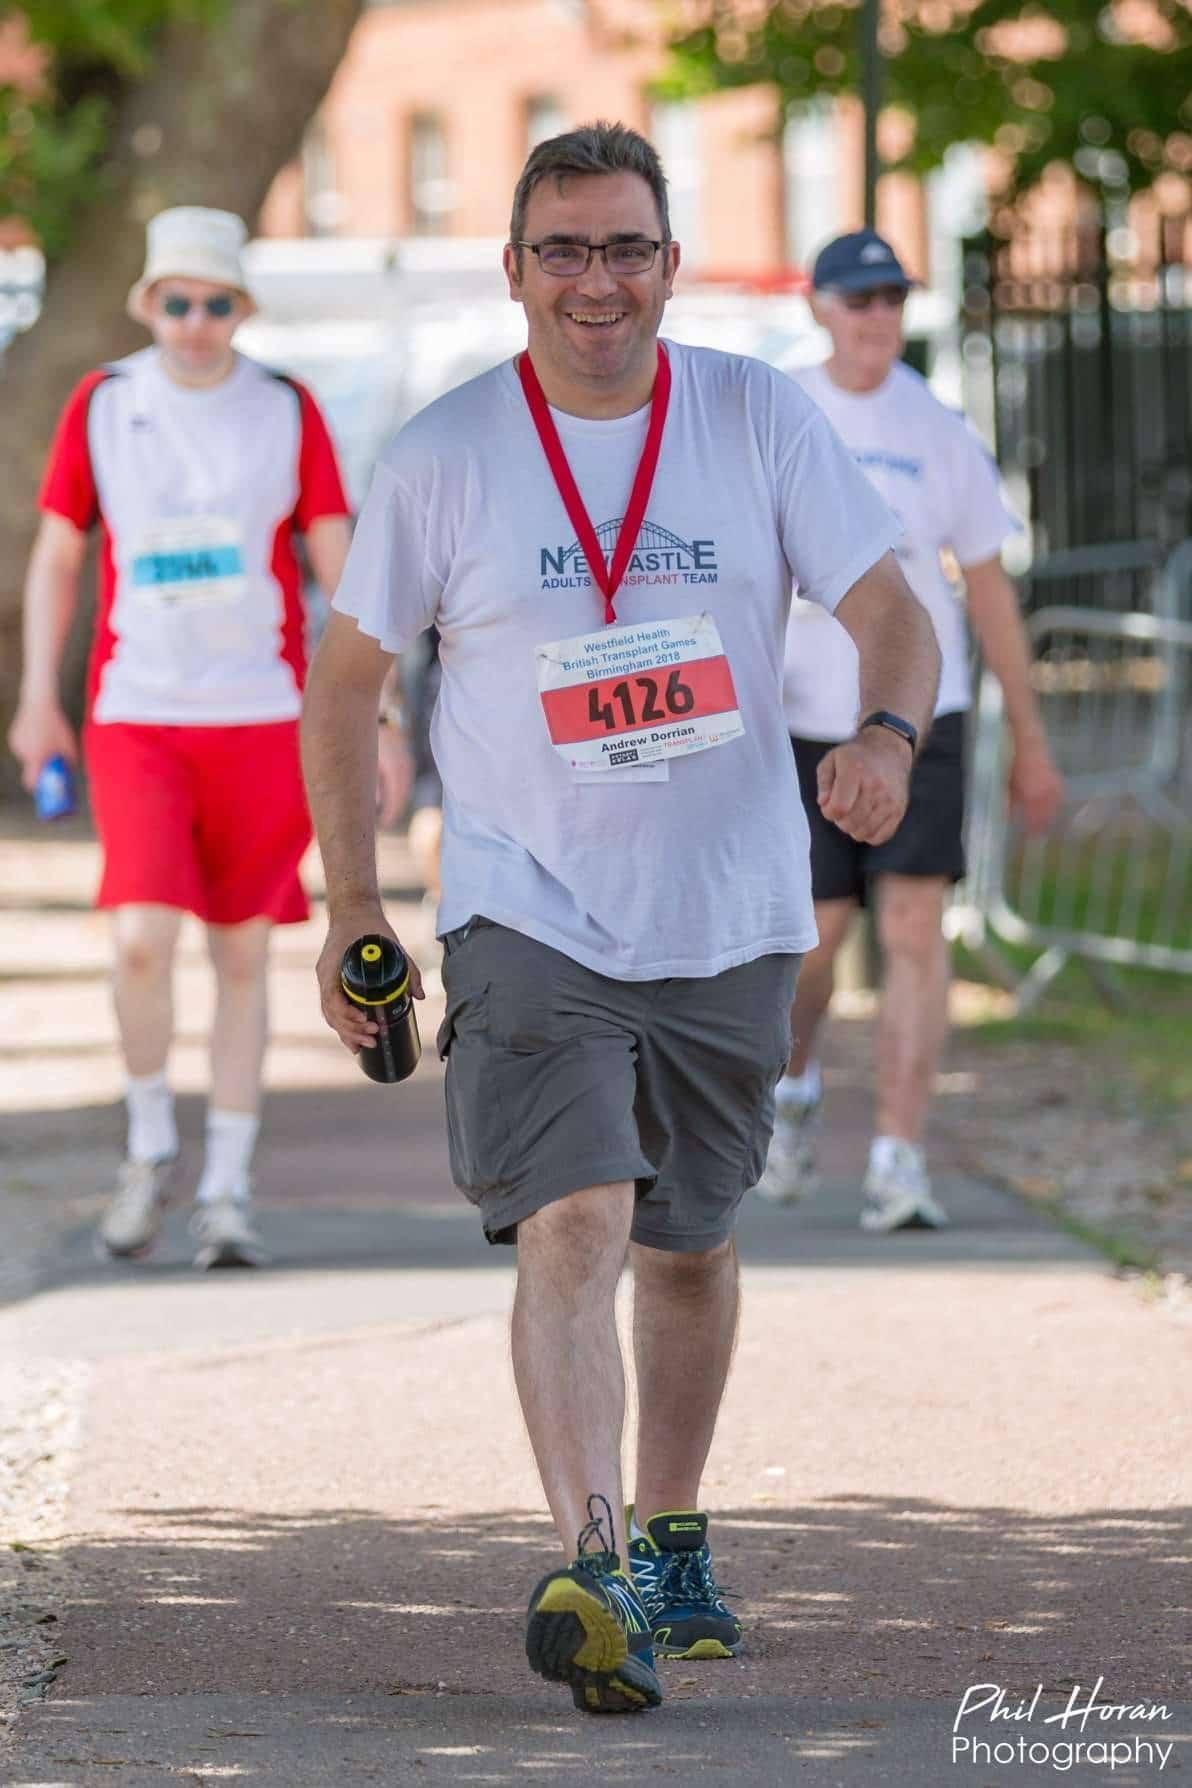 Andrew Dorrian at the British Transplant Games